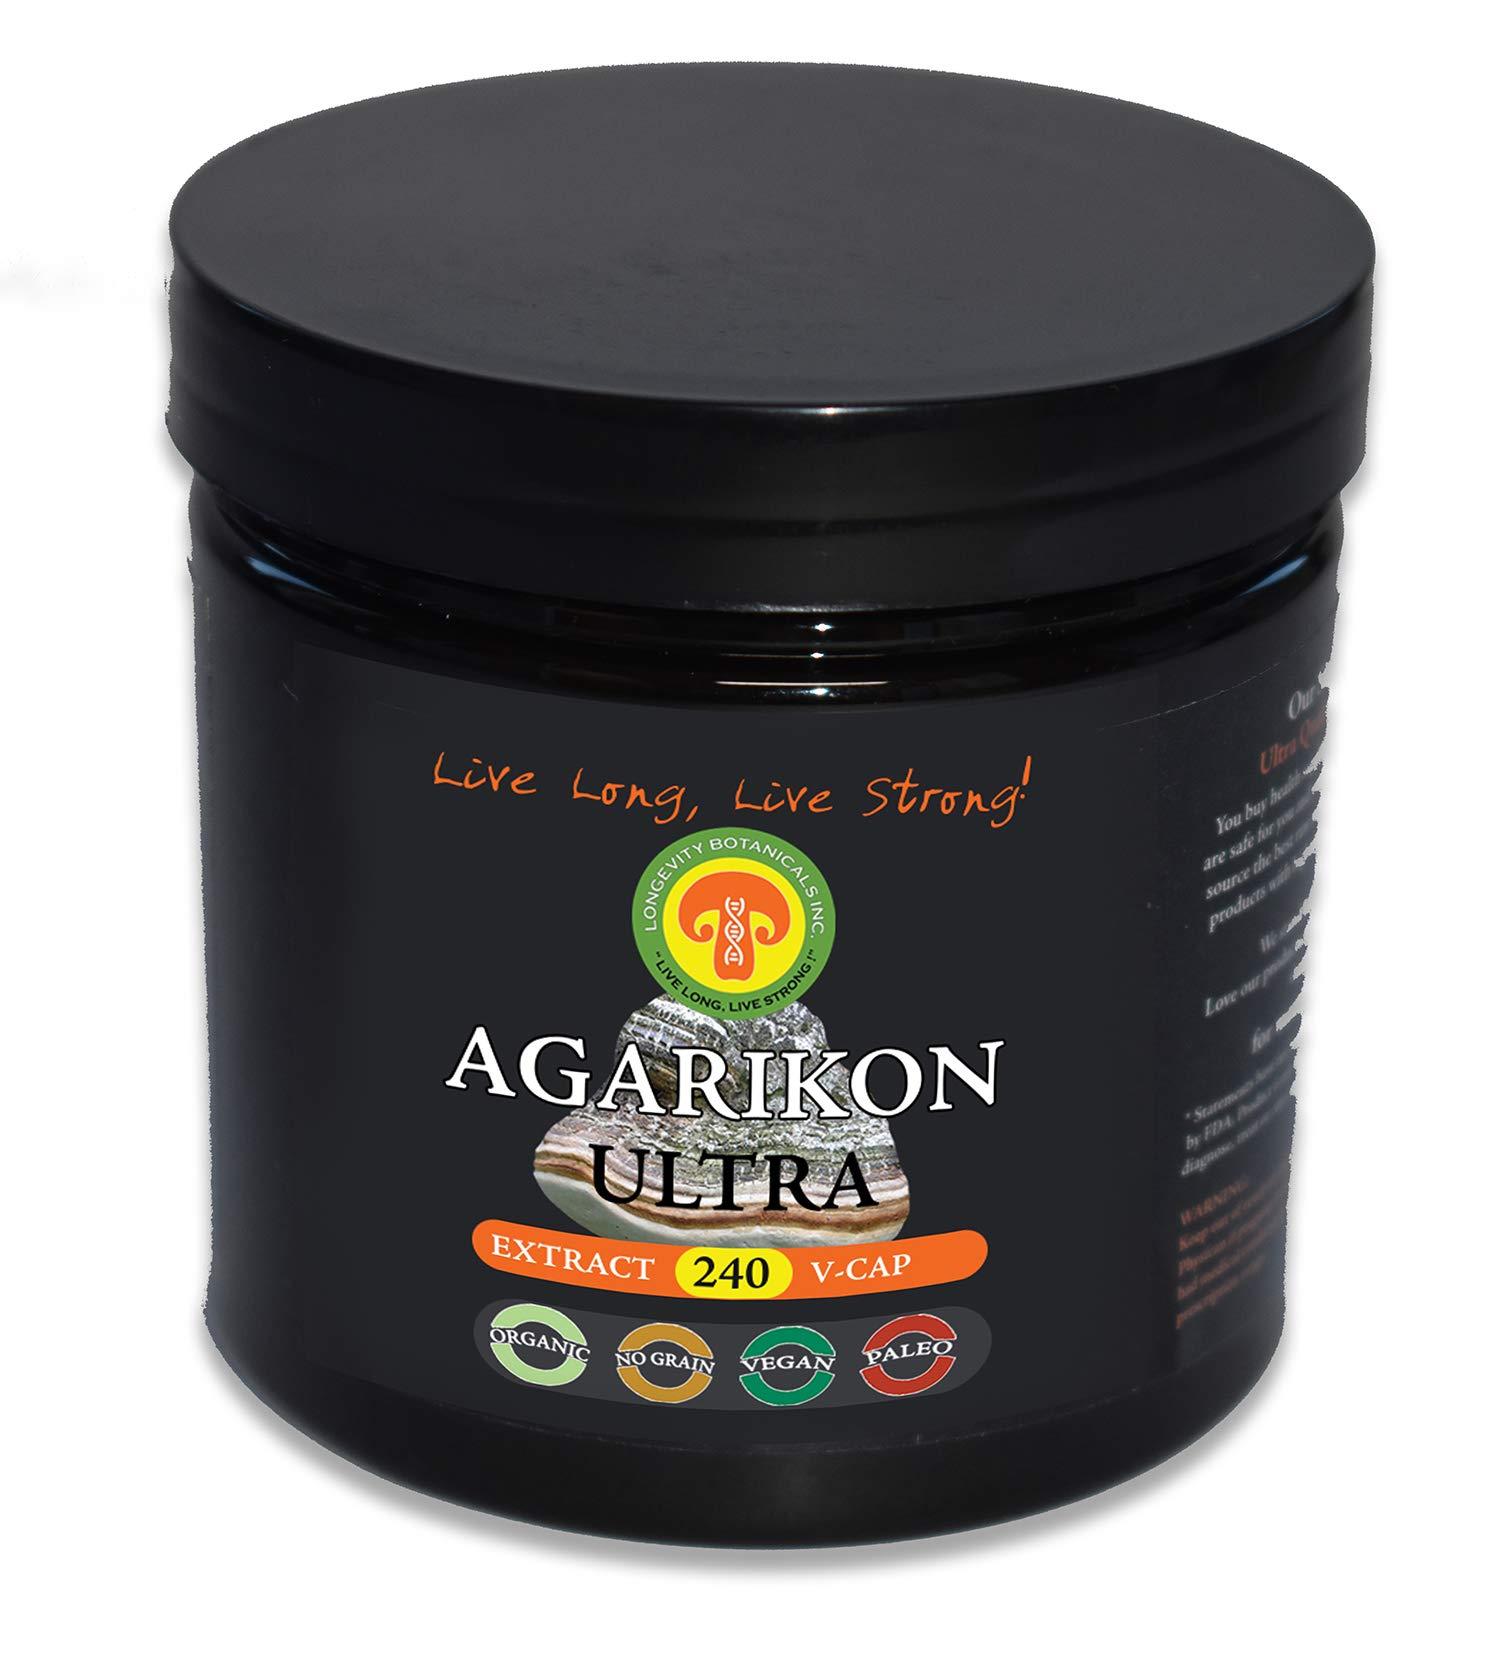 Organic AGARIKON Mushroom Powder Extract: Immunity Longevity Superstar, 240 Vegan Caps, 2 Month Supply, 30% Beta Glucans, Adult Strength, Fruiting Body, No Filler, Reduce Inflammation, Breathe Easier